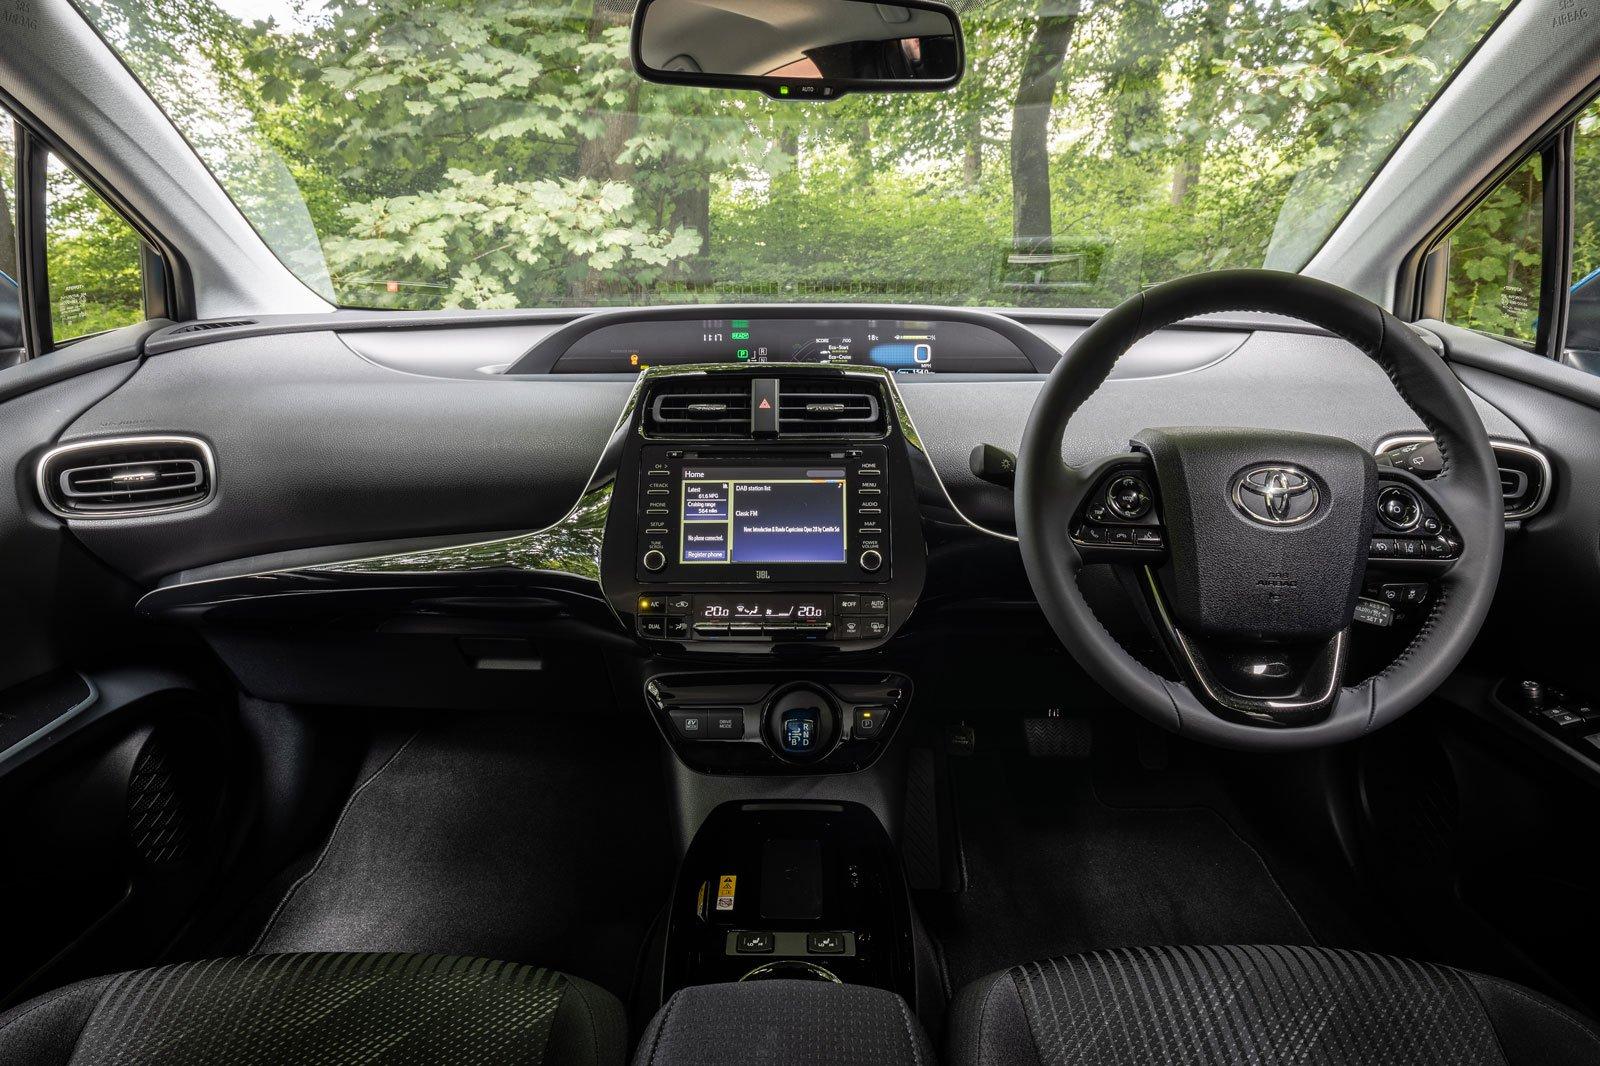 2019 toyota prius awd-i interior dashboard